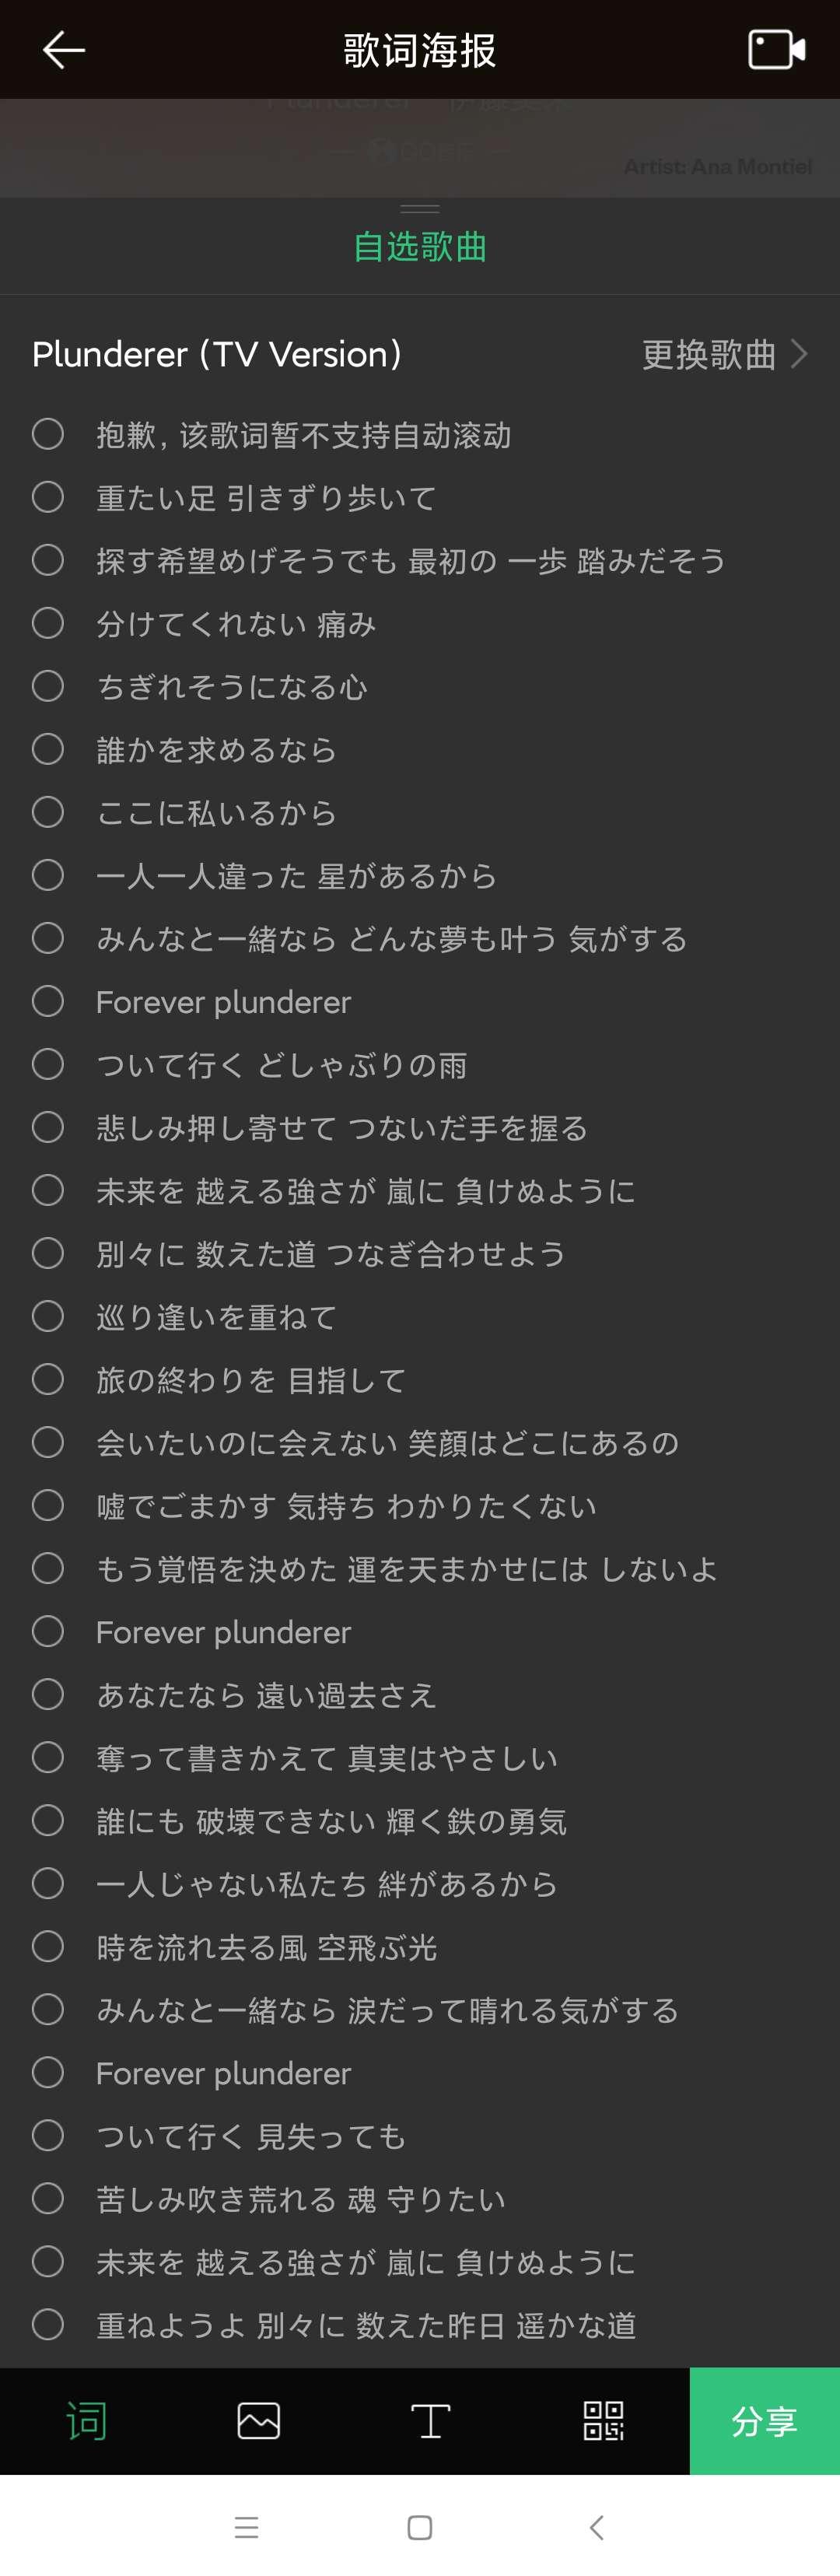 【动漫音乐】Plunderer